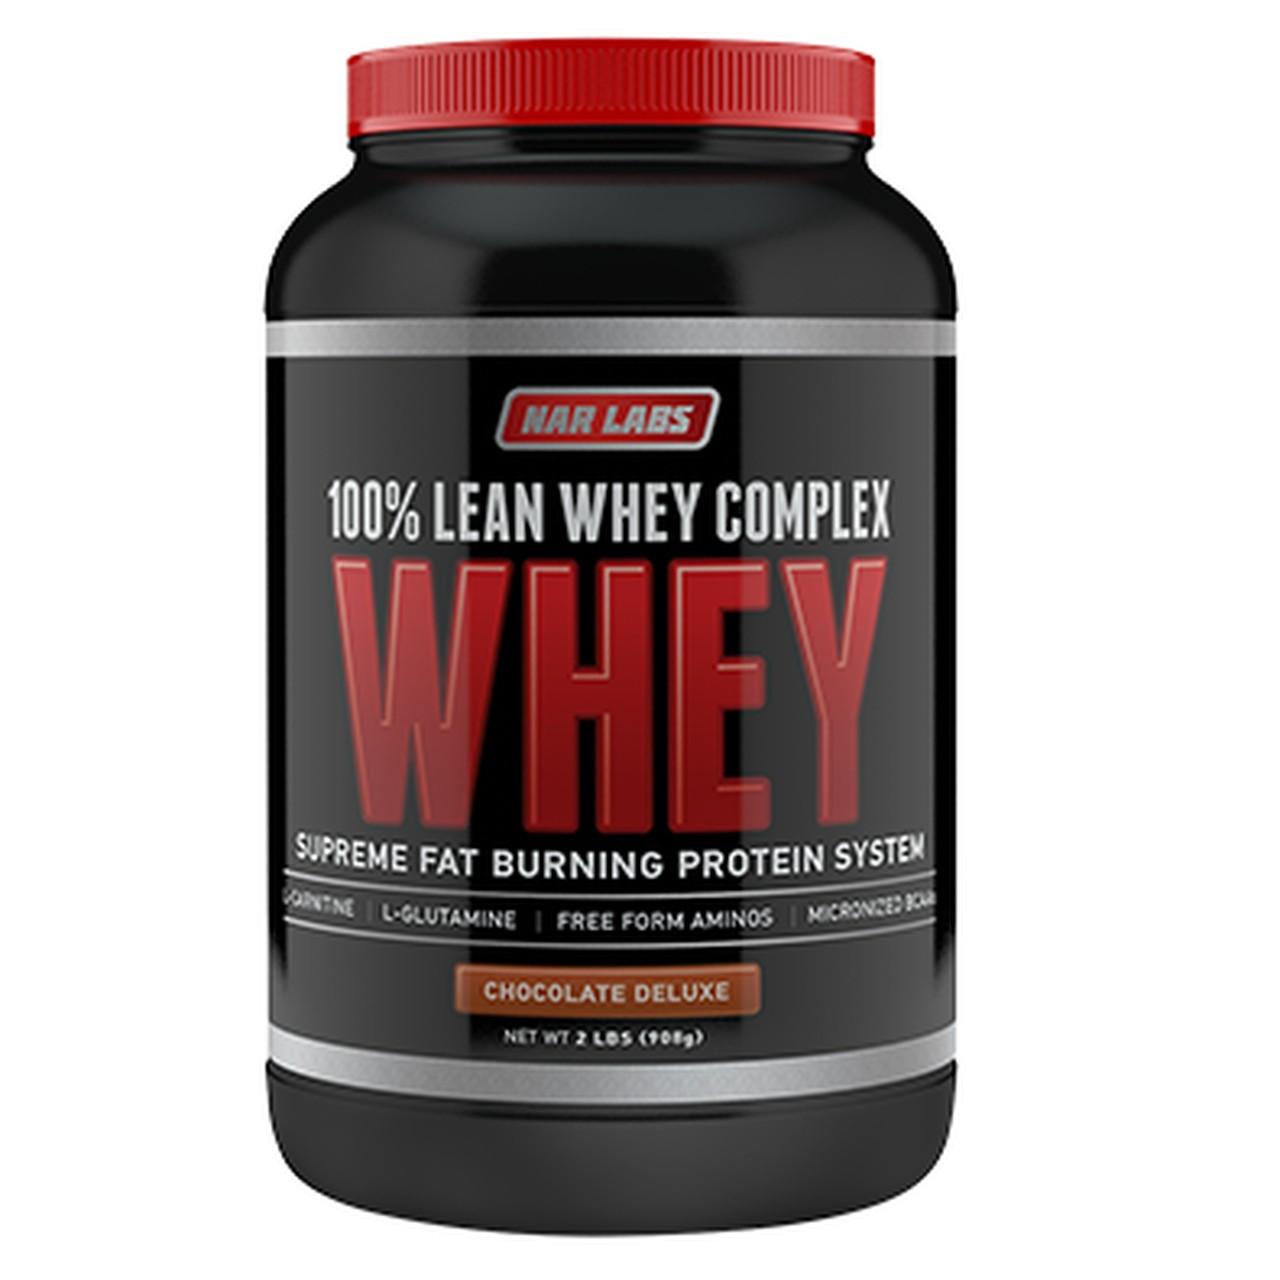 100% Lean Whey Complex (908g) - Nar Labs